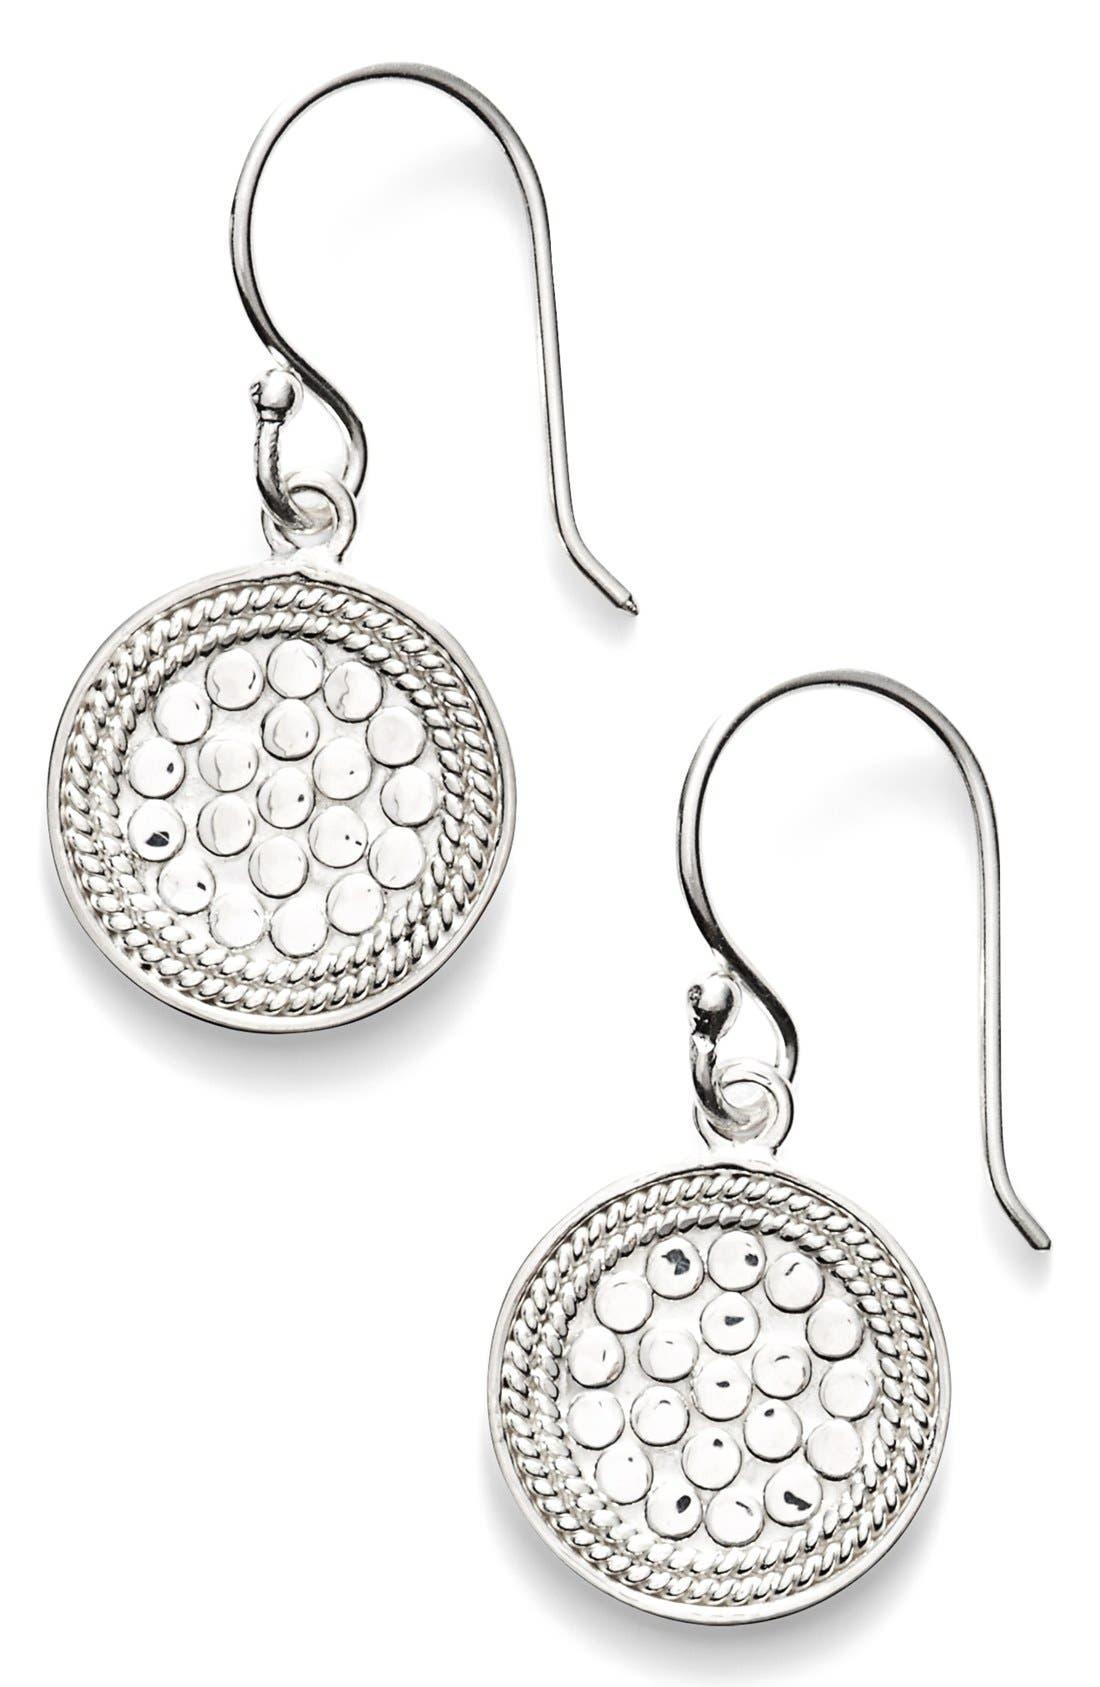 'Gili' Small Drop Earrings,                         Main,                         color, SILVER